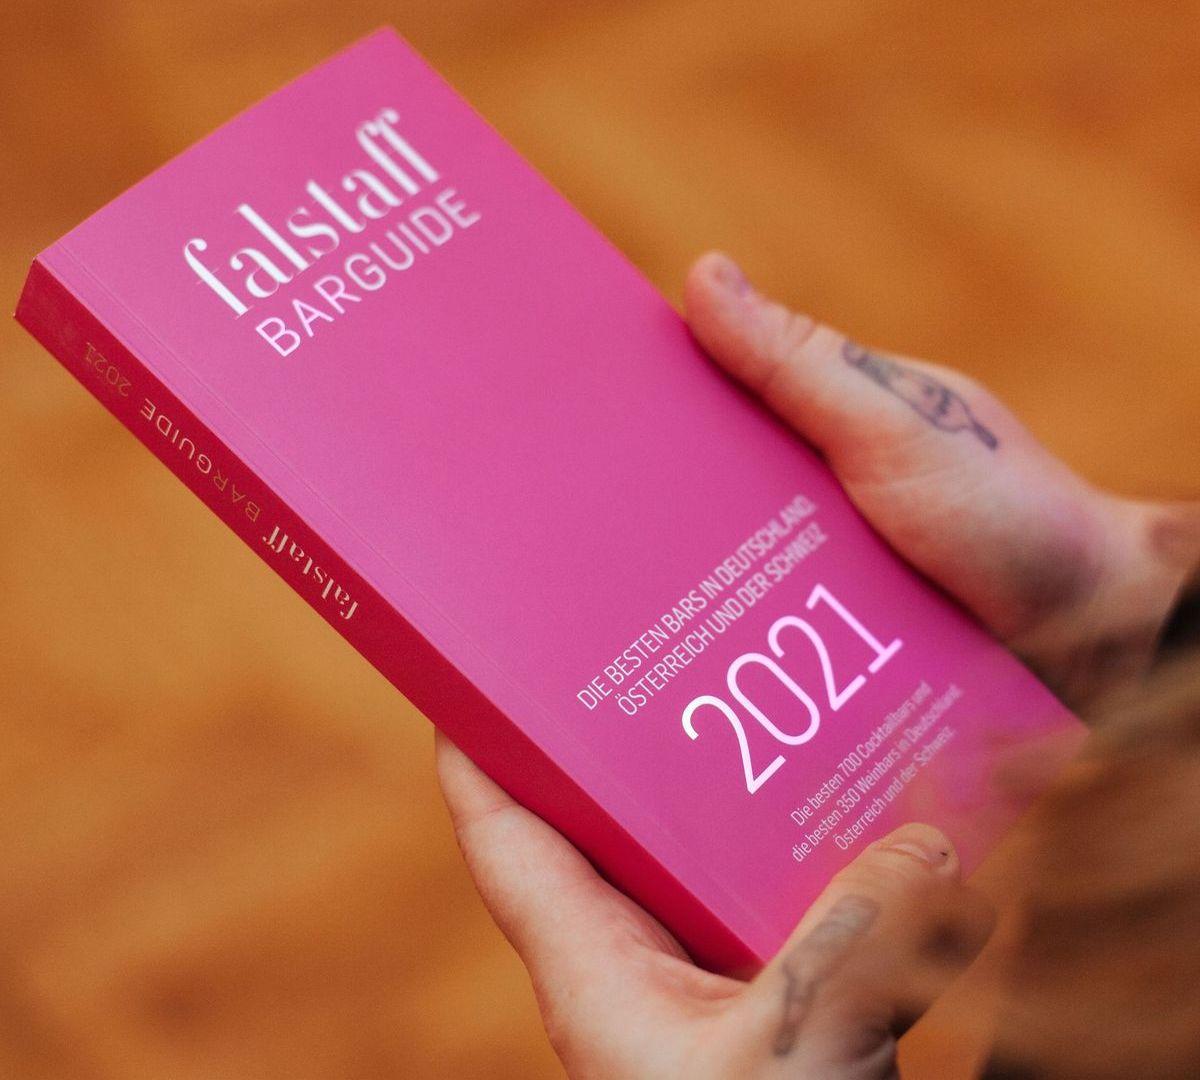 Falstaff Weinbar- und Cocktailbarguide 2021 Barguide 2021 | 9,90 Euro